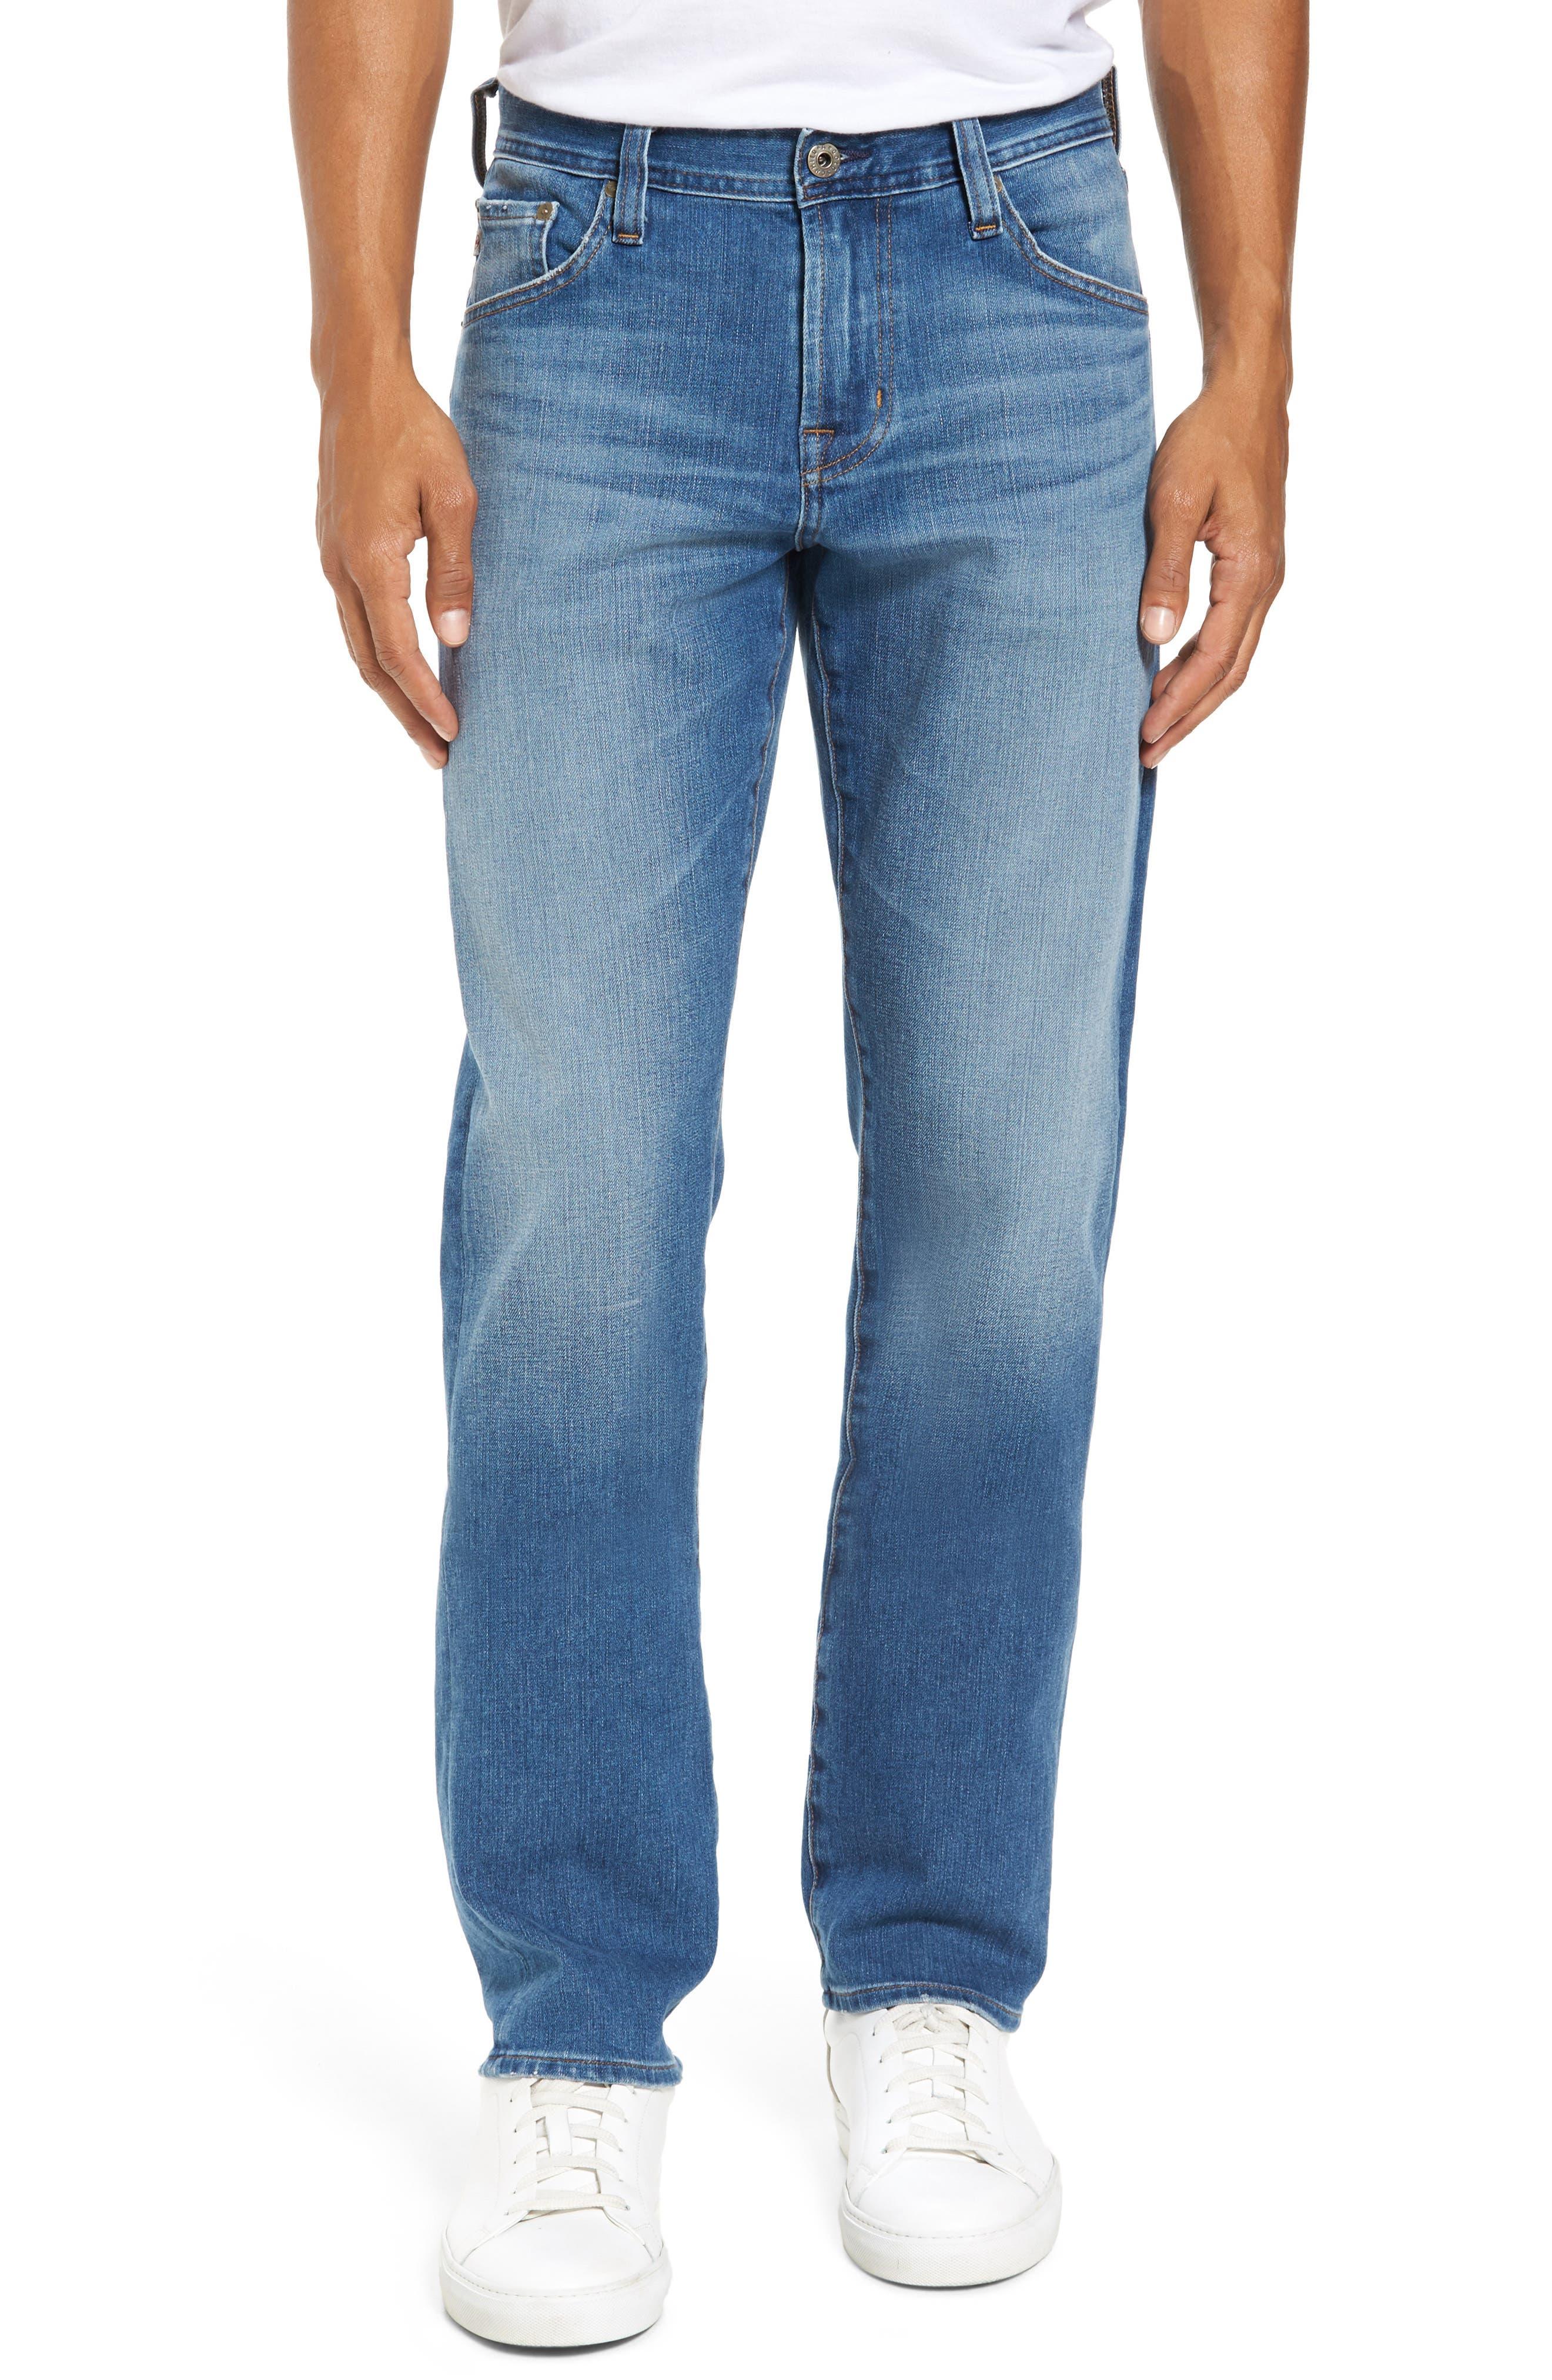 Graduate Slim Straight Fit Jeans,                             Main thumbnail 1, color,                             456